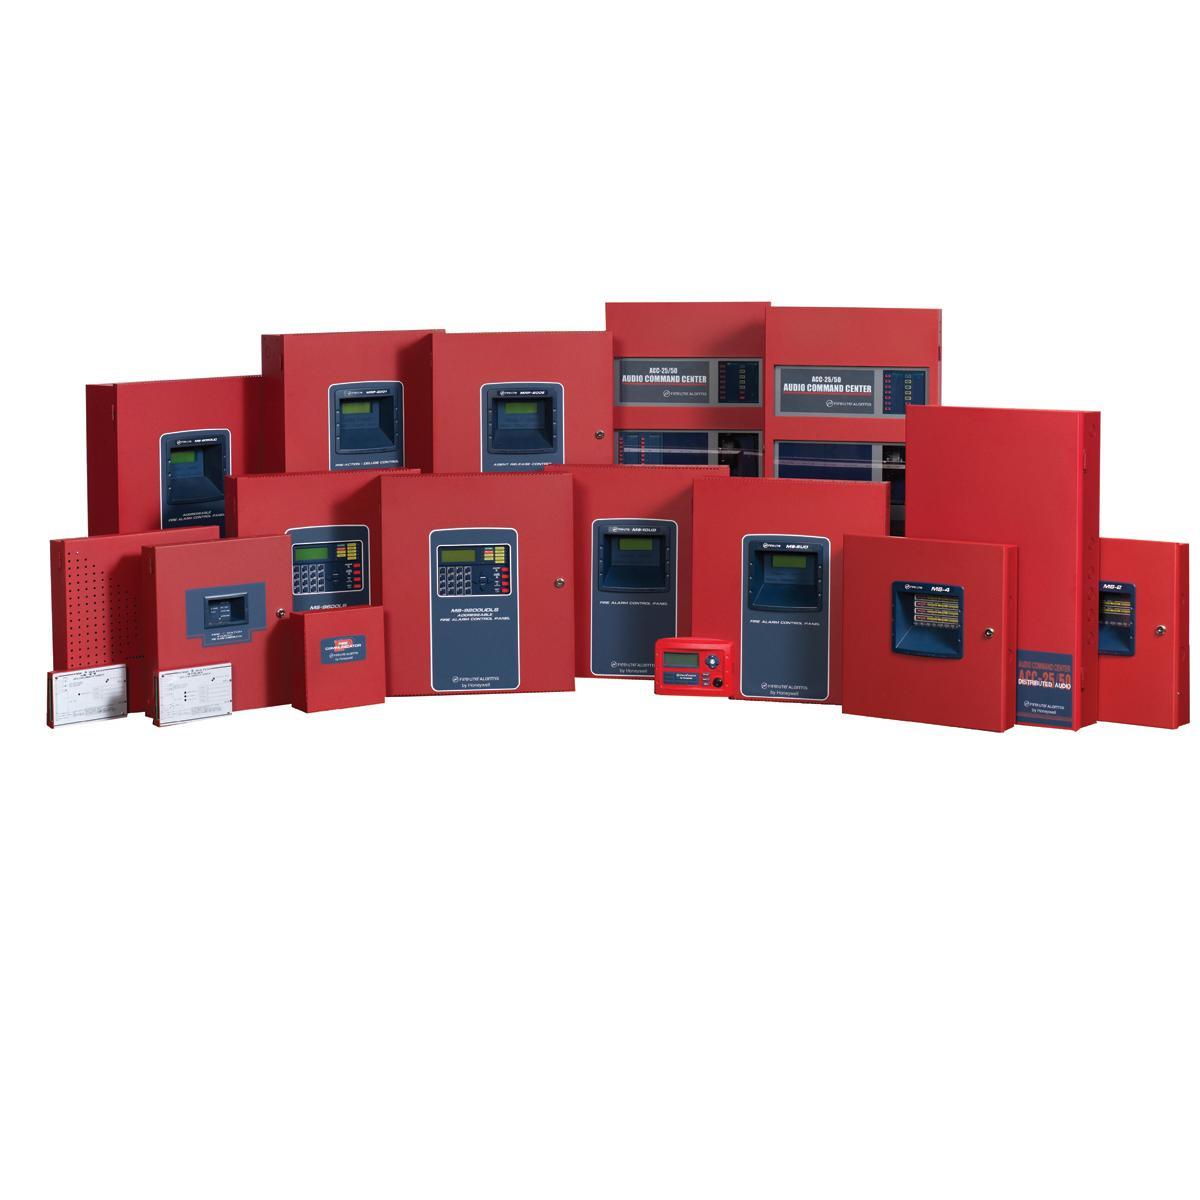 FireLite Fire Alarm Systems